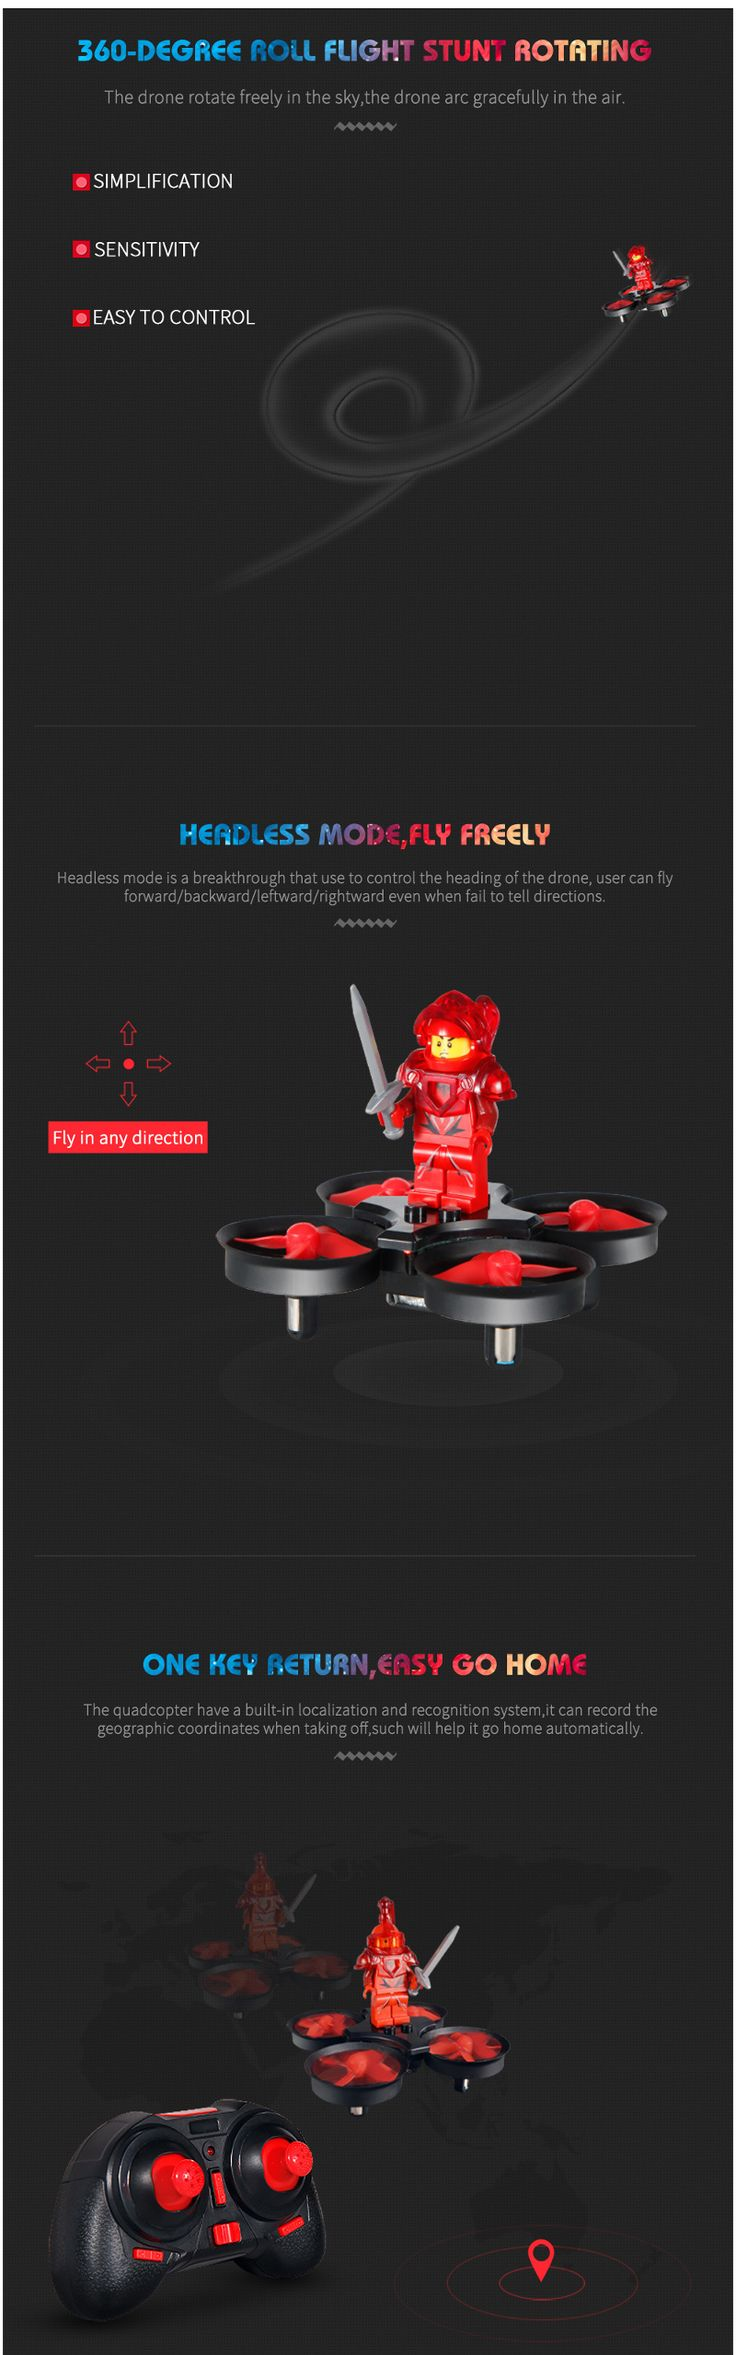 Eachine E011 Mini 2.4G Headless Mode With 60000RPM 716 Coreless Motor Toy Brick RC Quadcopter RTF